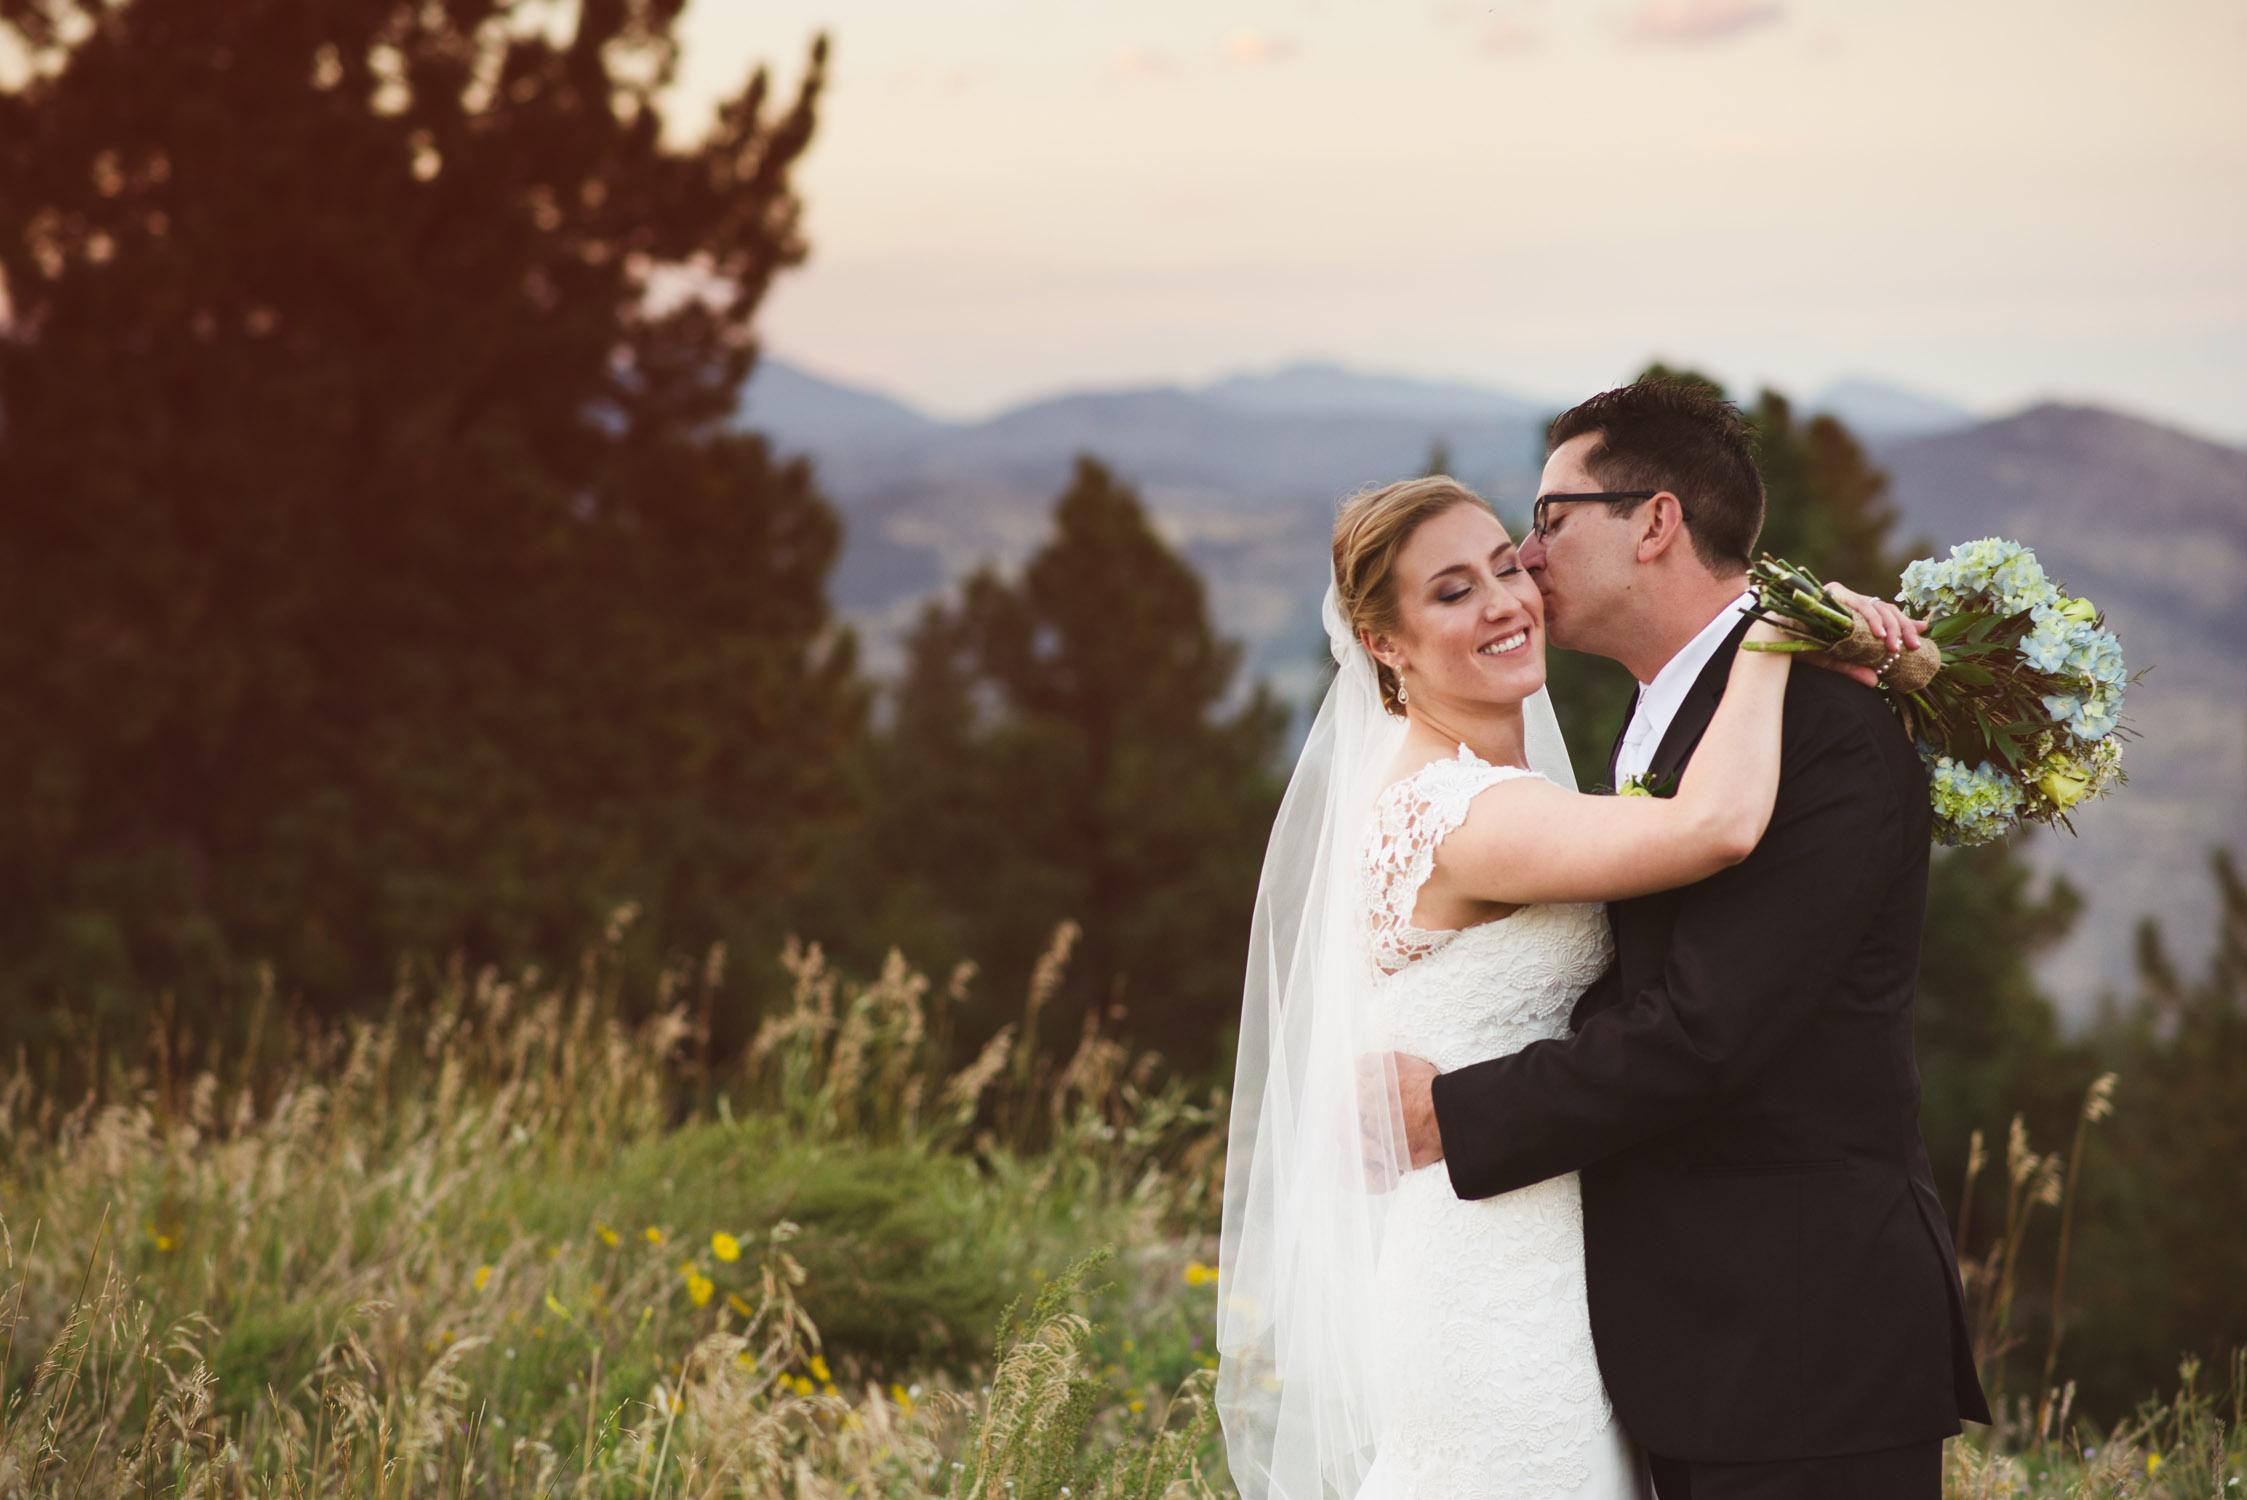 Joanna_Jason_Golden_Colorado_Wedding_10.jpg